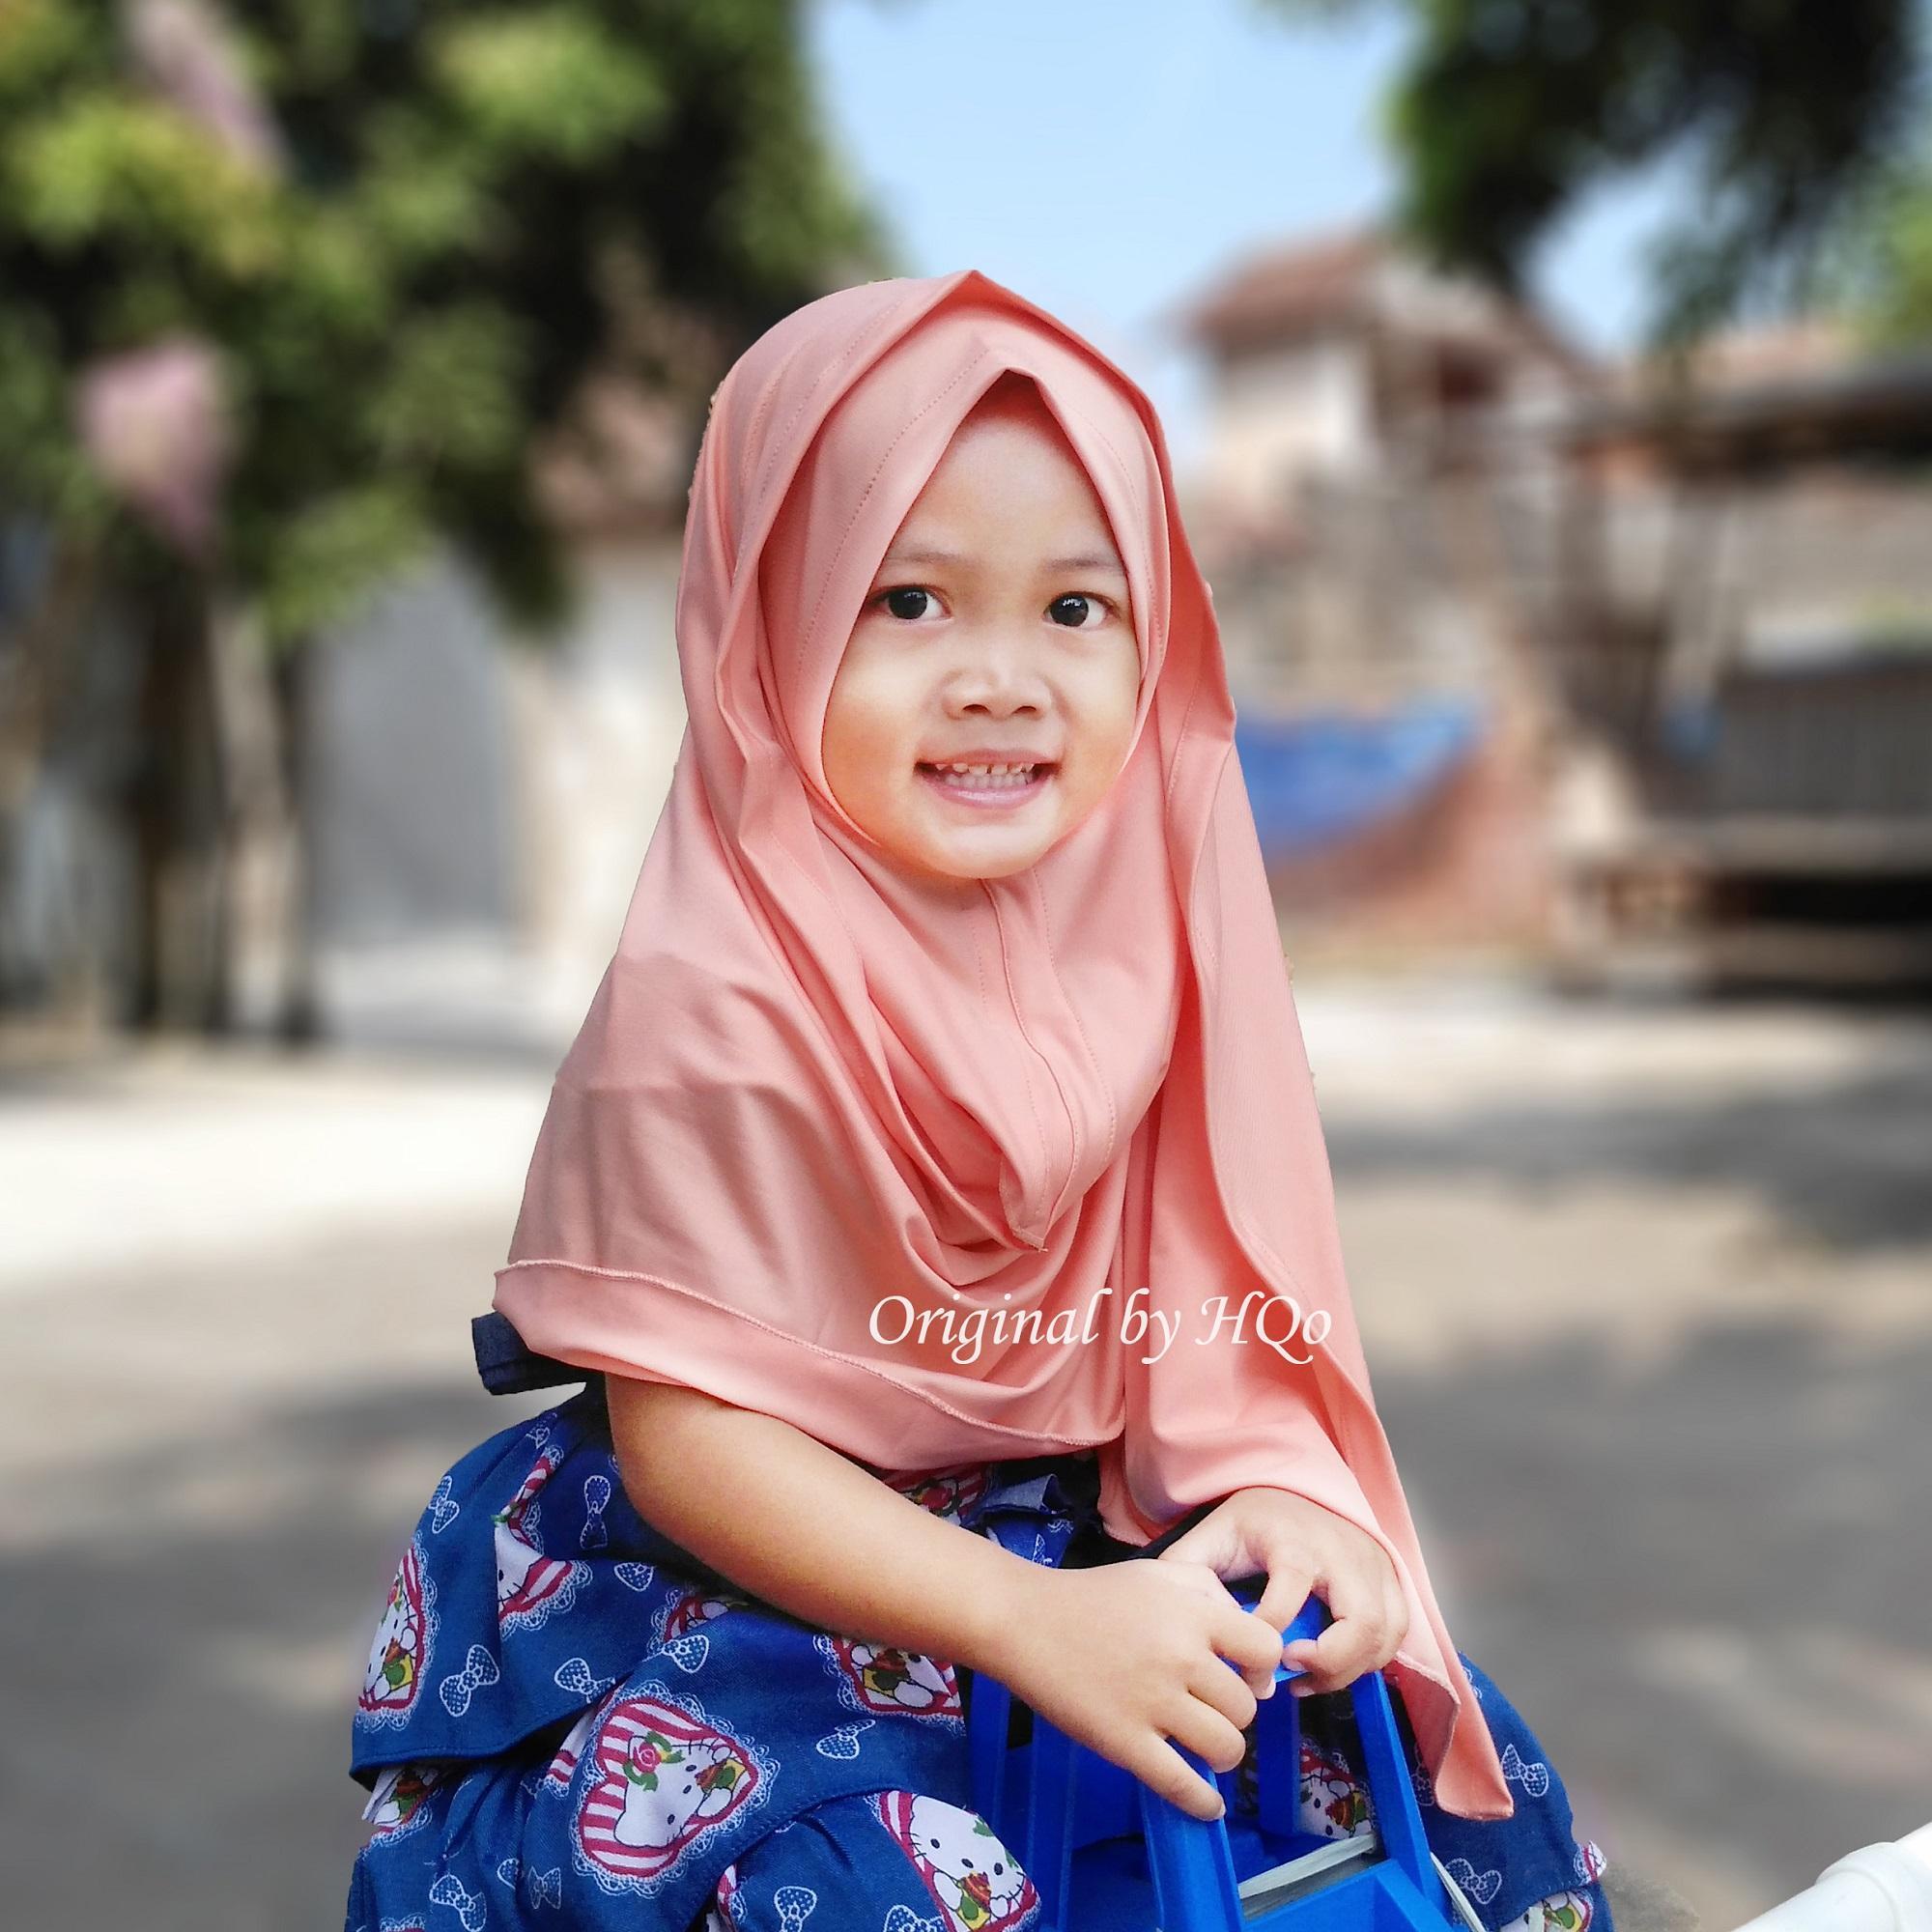 Cek Harga Baru Hqo Kerudung Anak Bayi Jilbab Anak Lucu Hijab Anak